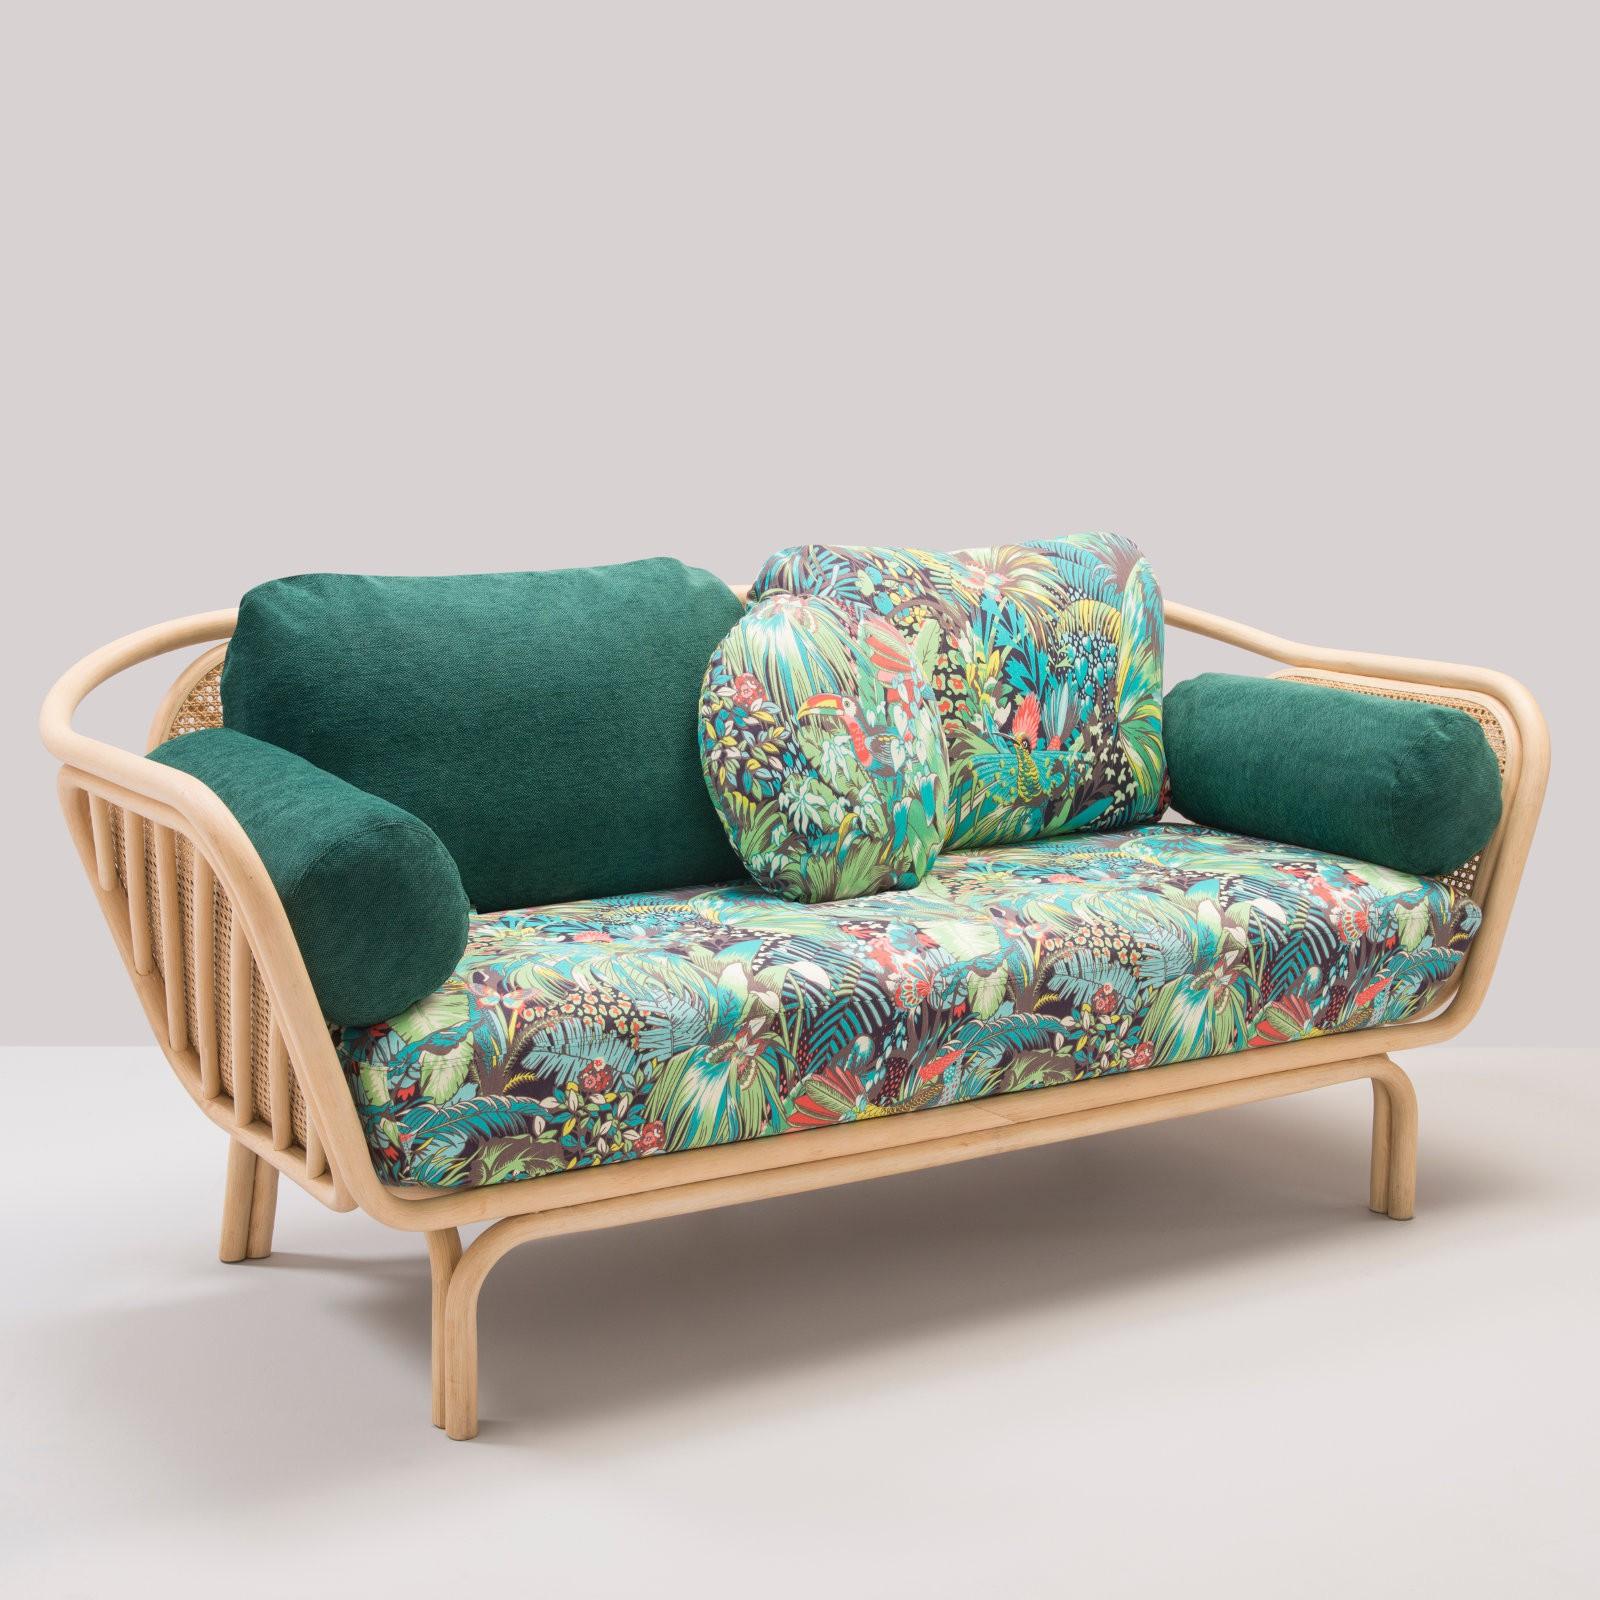 Jungle Boa Design Rattan Sofa Loading Zoom